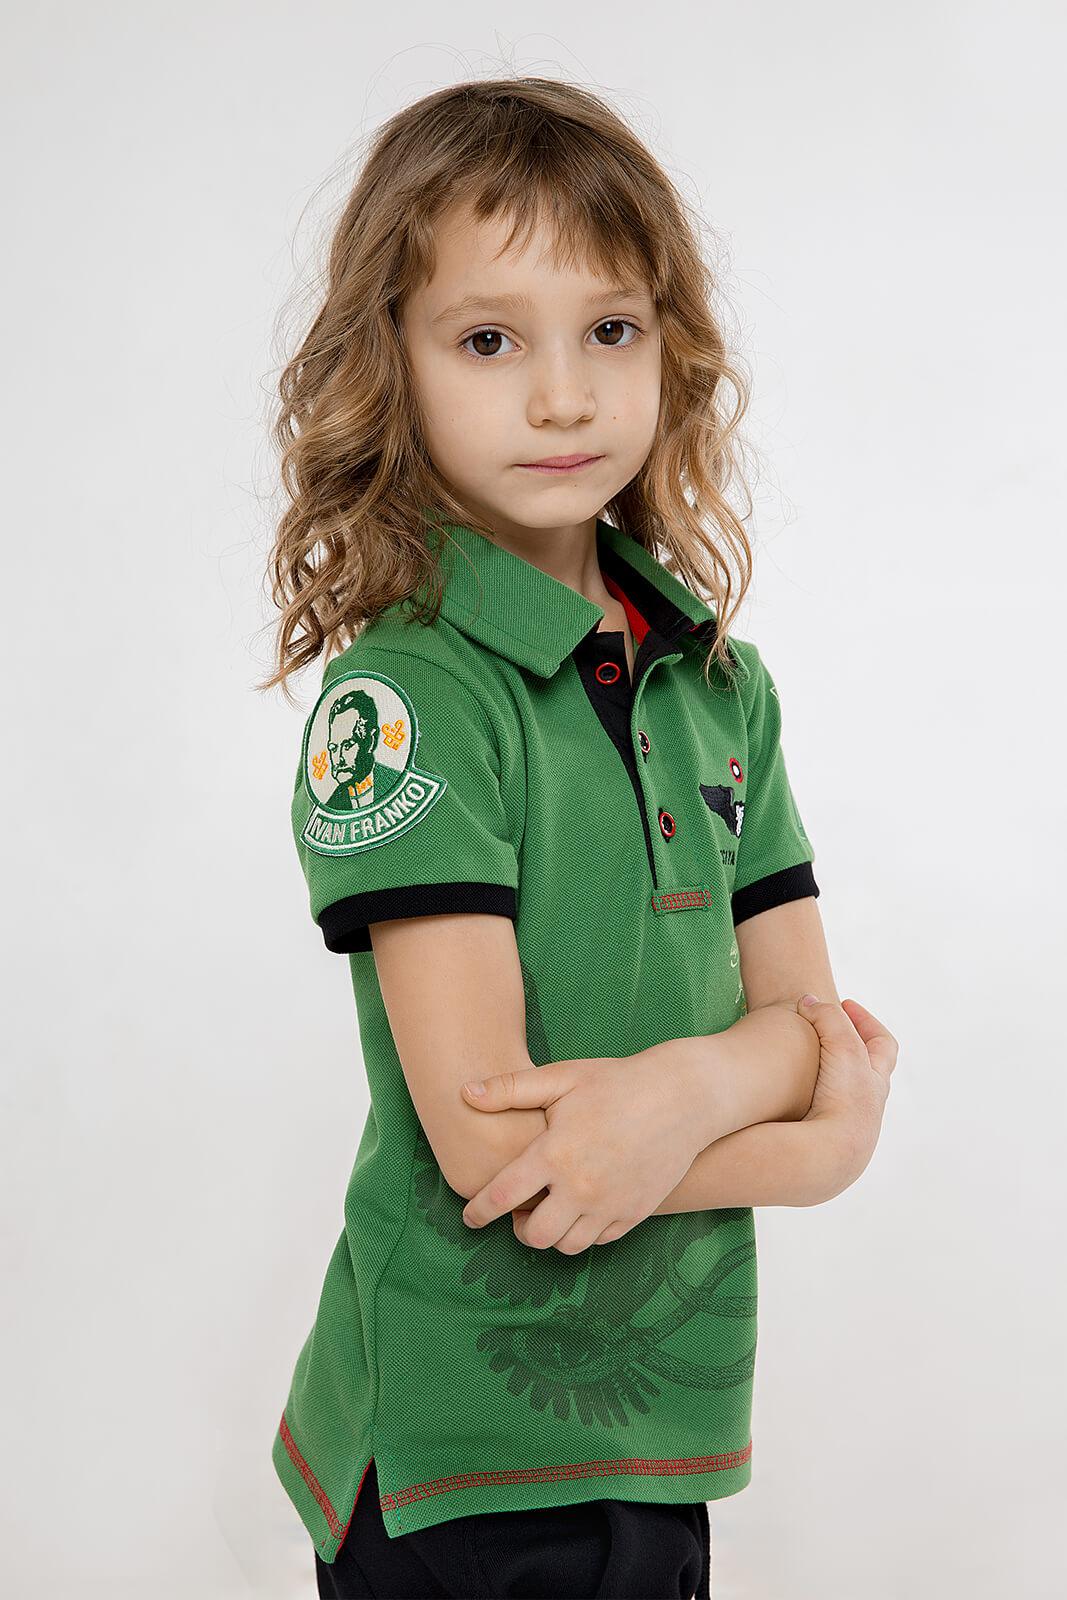 Kids Polo Shirt Ivan Franko. Color green.  Material: 100% cotton.